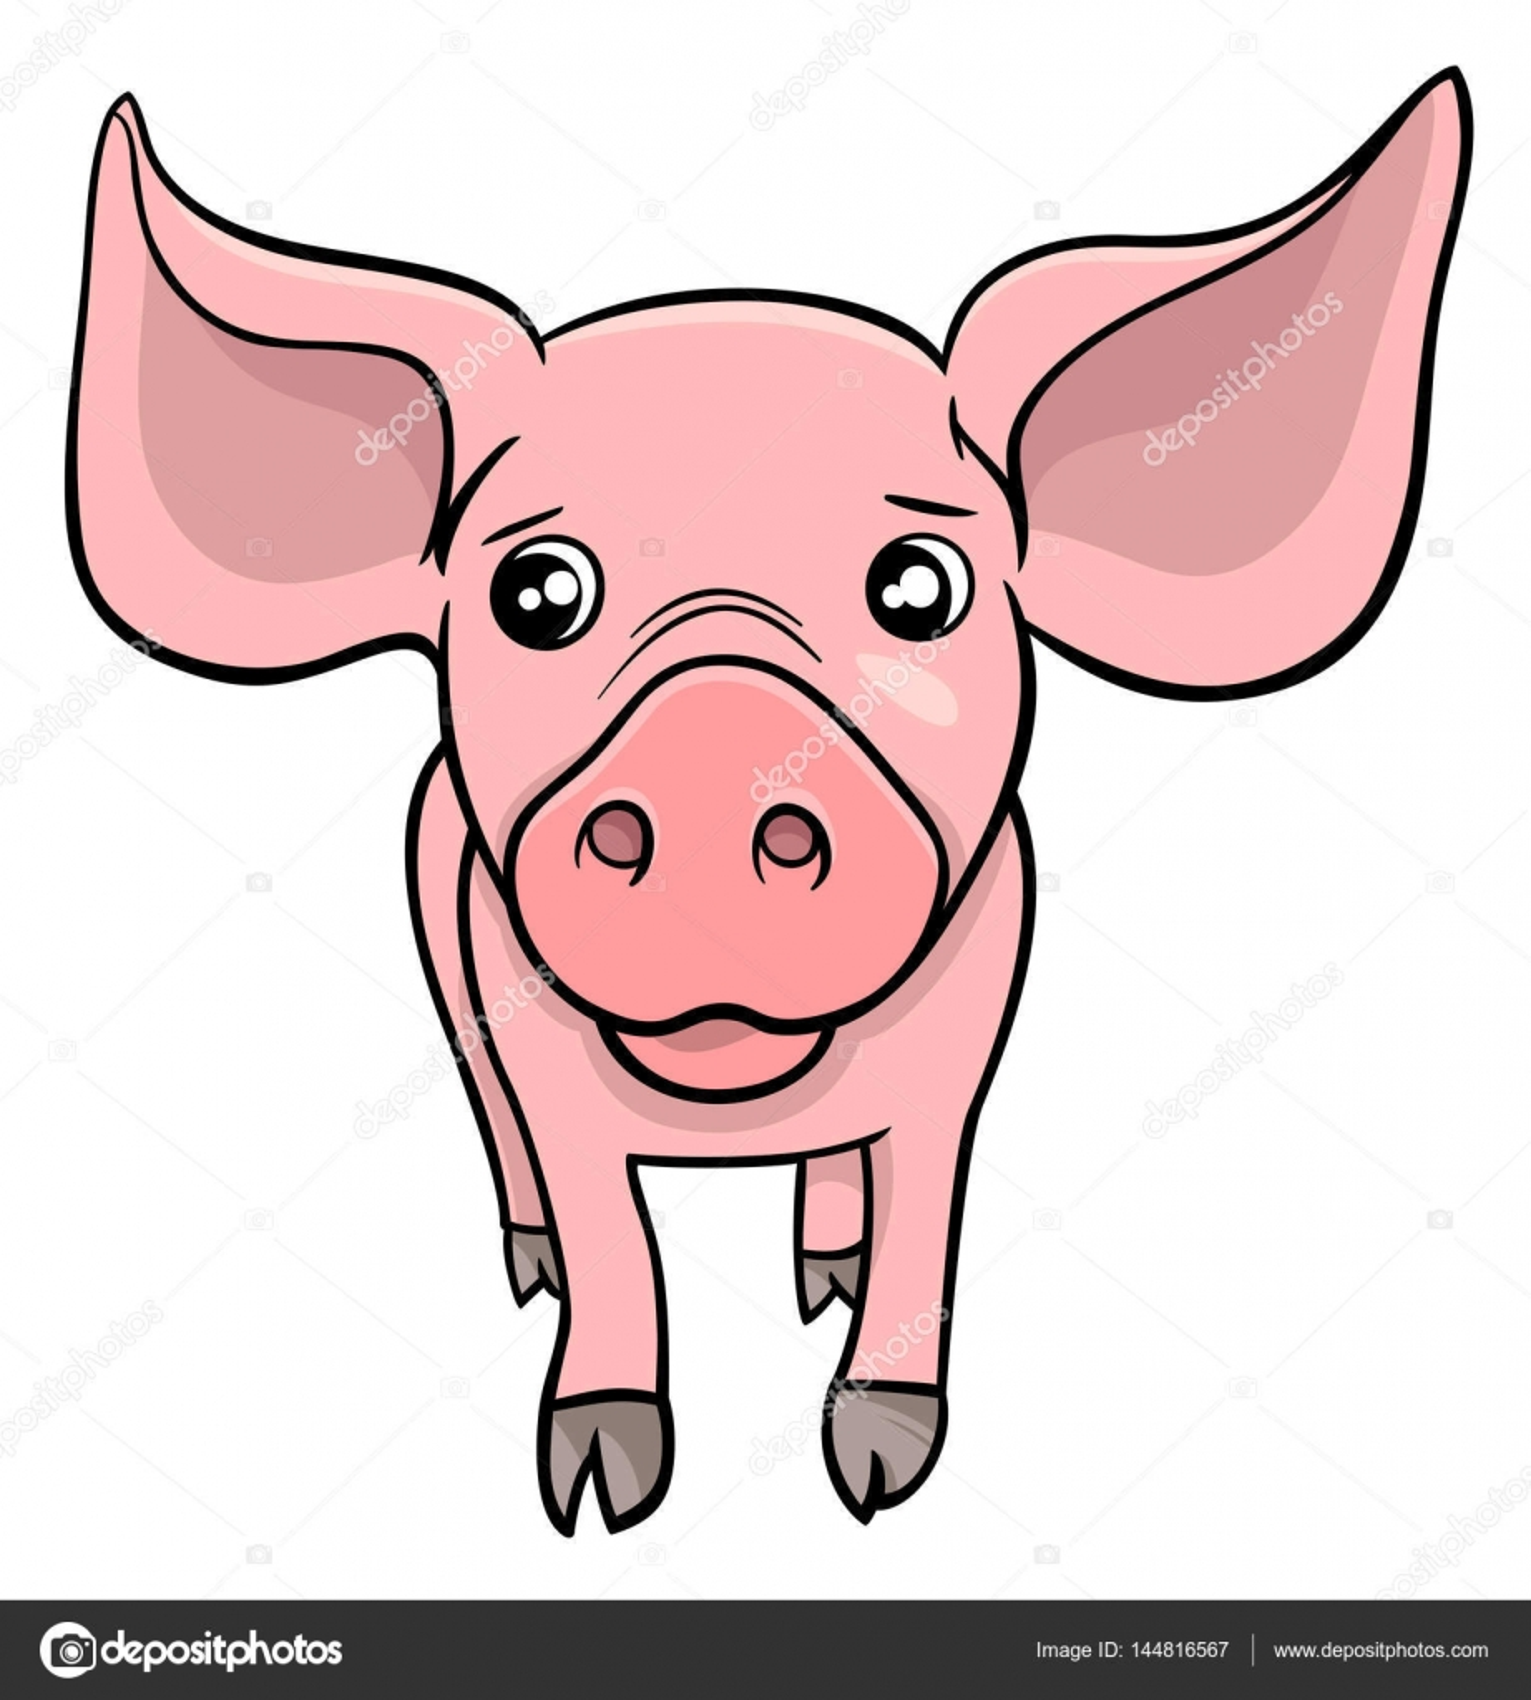 personaje de dibujos animados de cerdo o cochinillo — Archivo ...